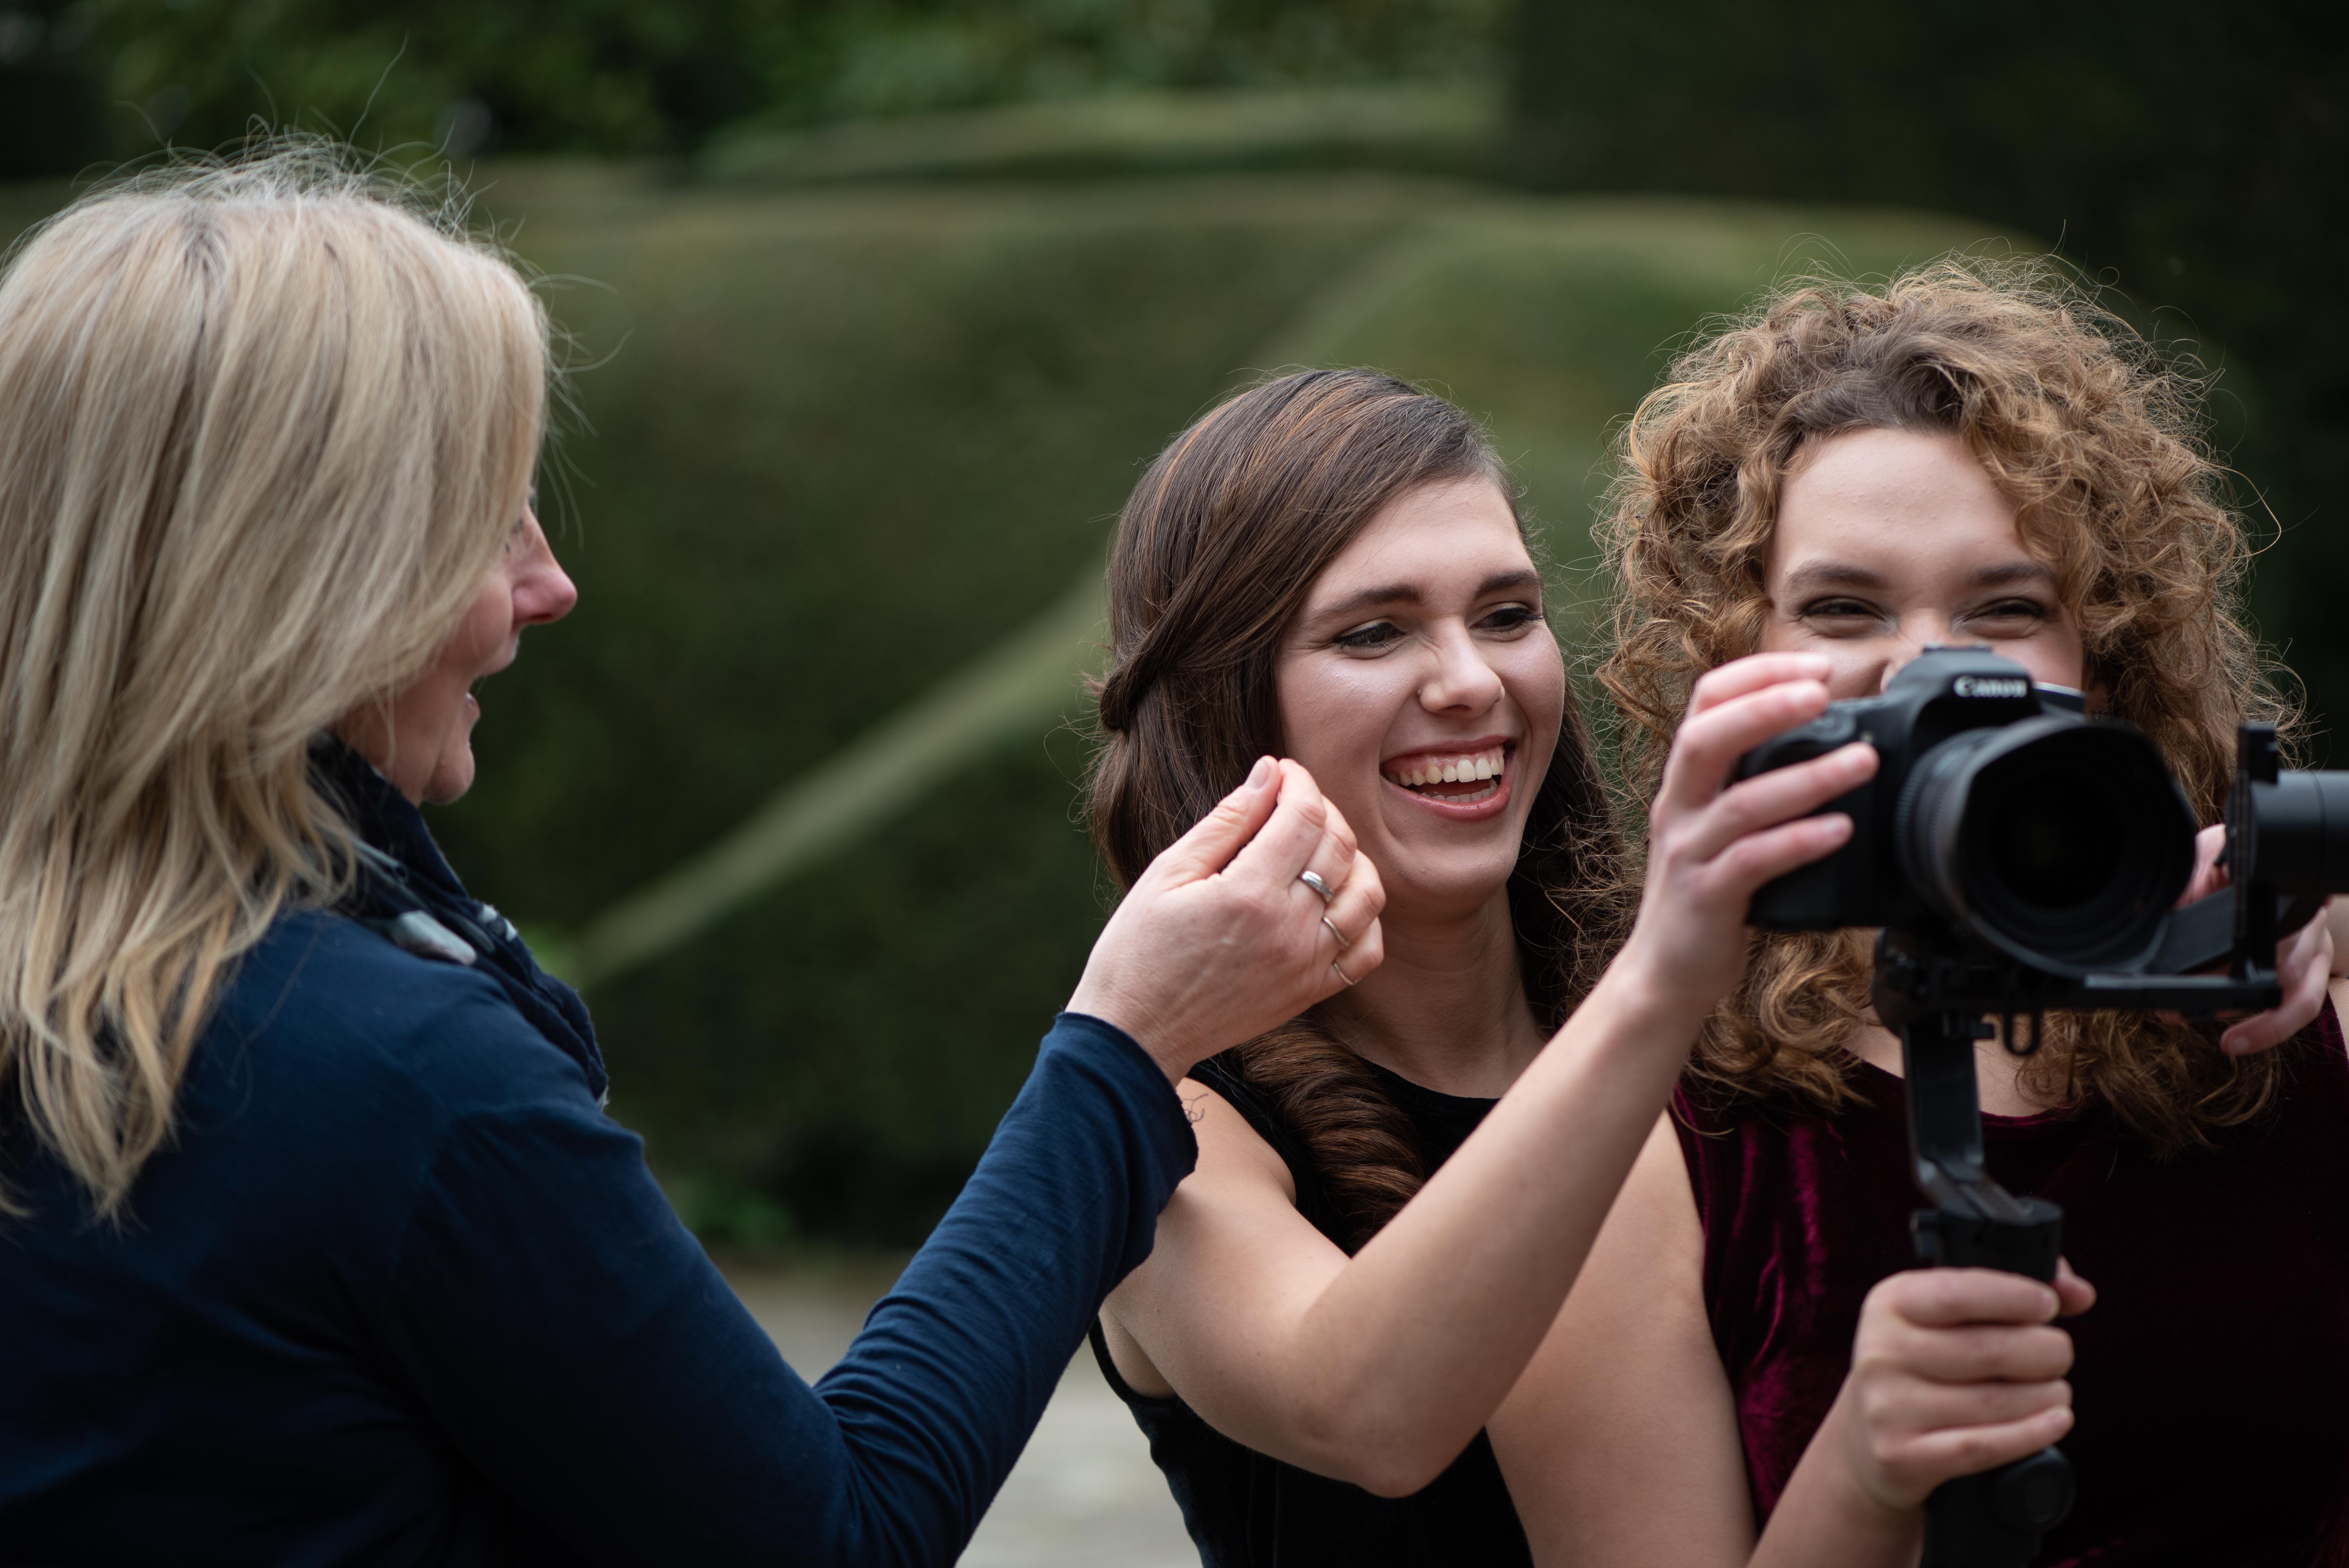 Harpists Karina and Adel holding a video camera, Gillian Smissen, doing makeup